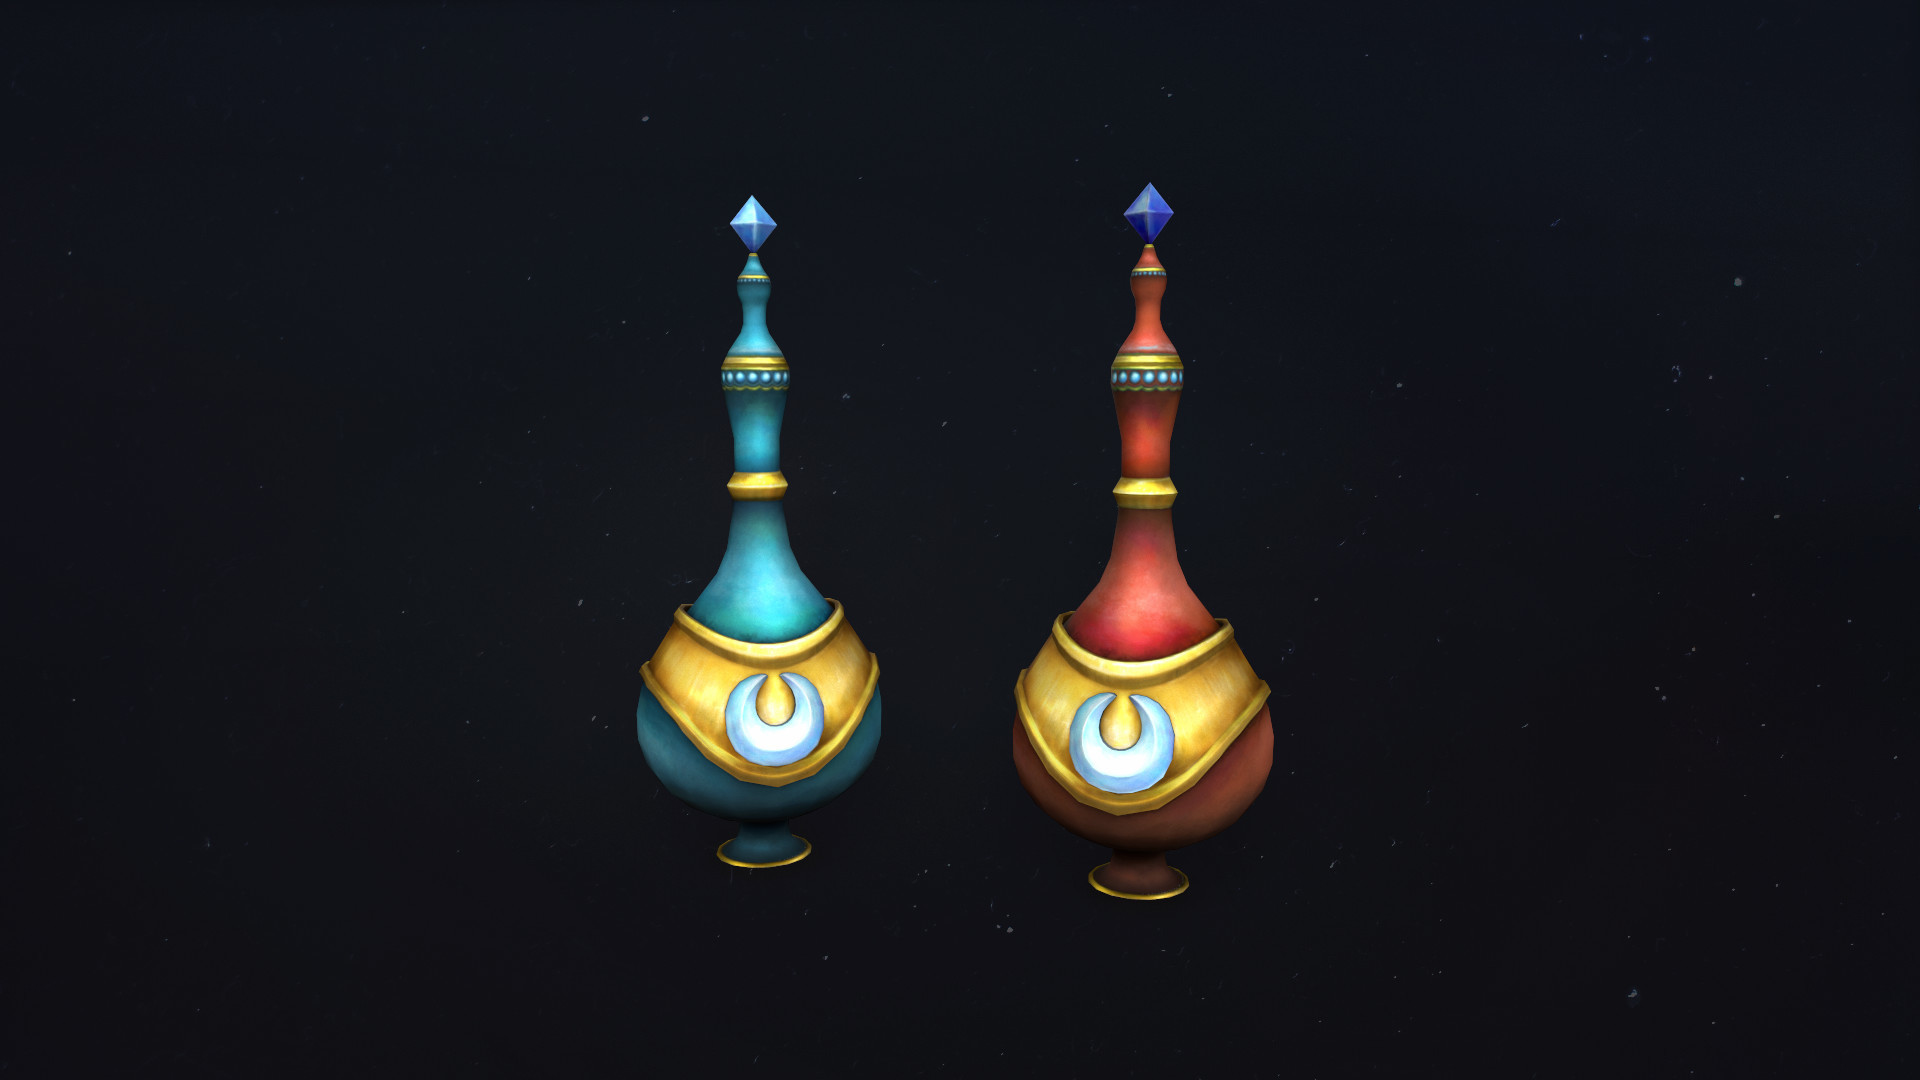 Ines merino vase01